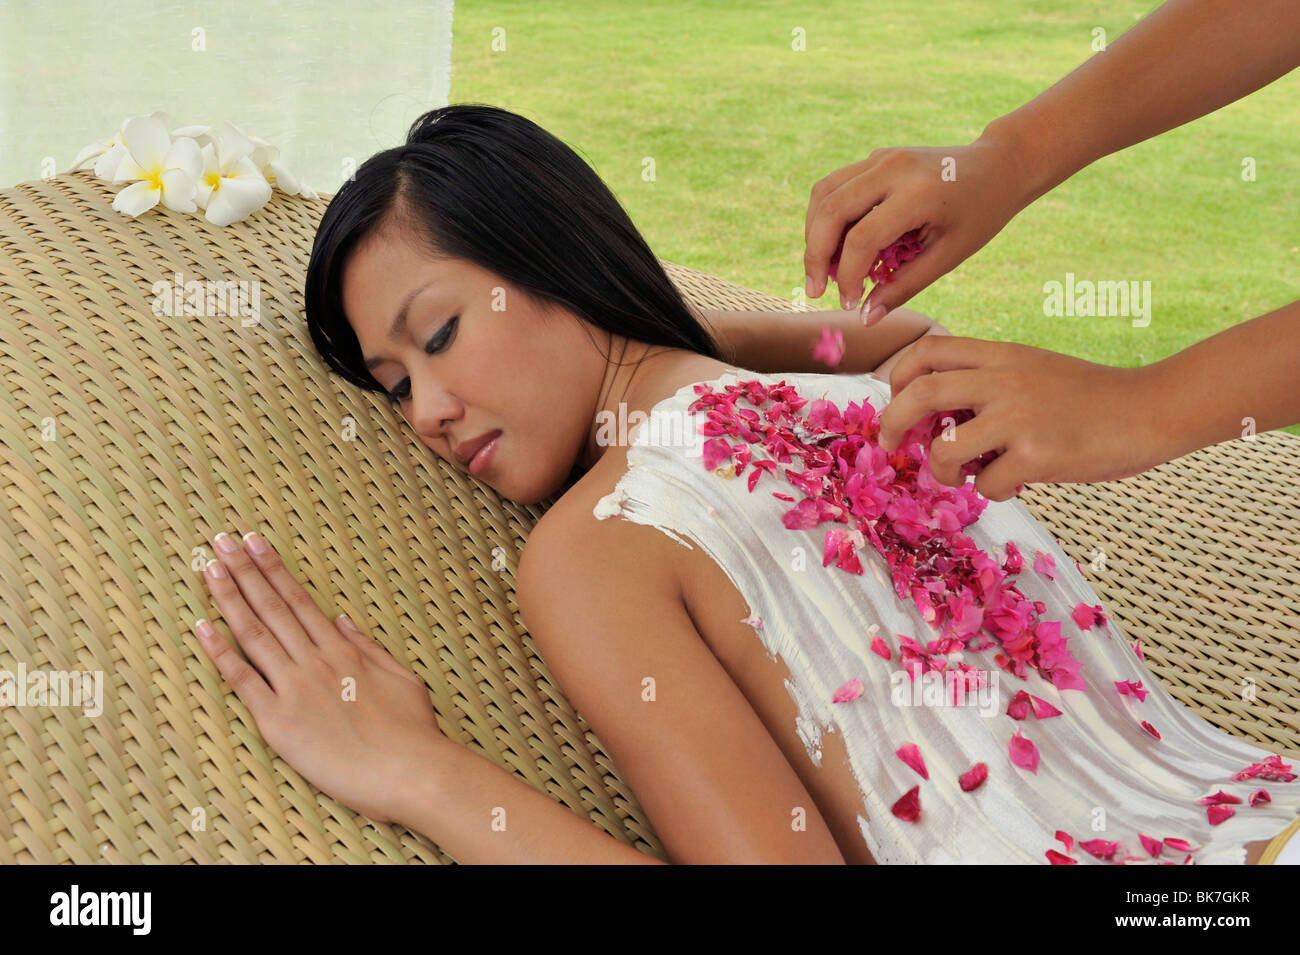 Kaolin-Gesichtsmaske mit Rosenblüten Stockbild